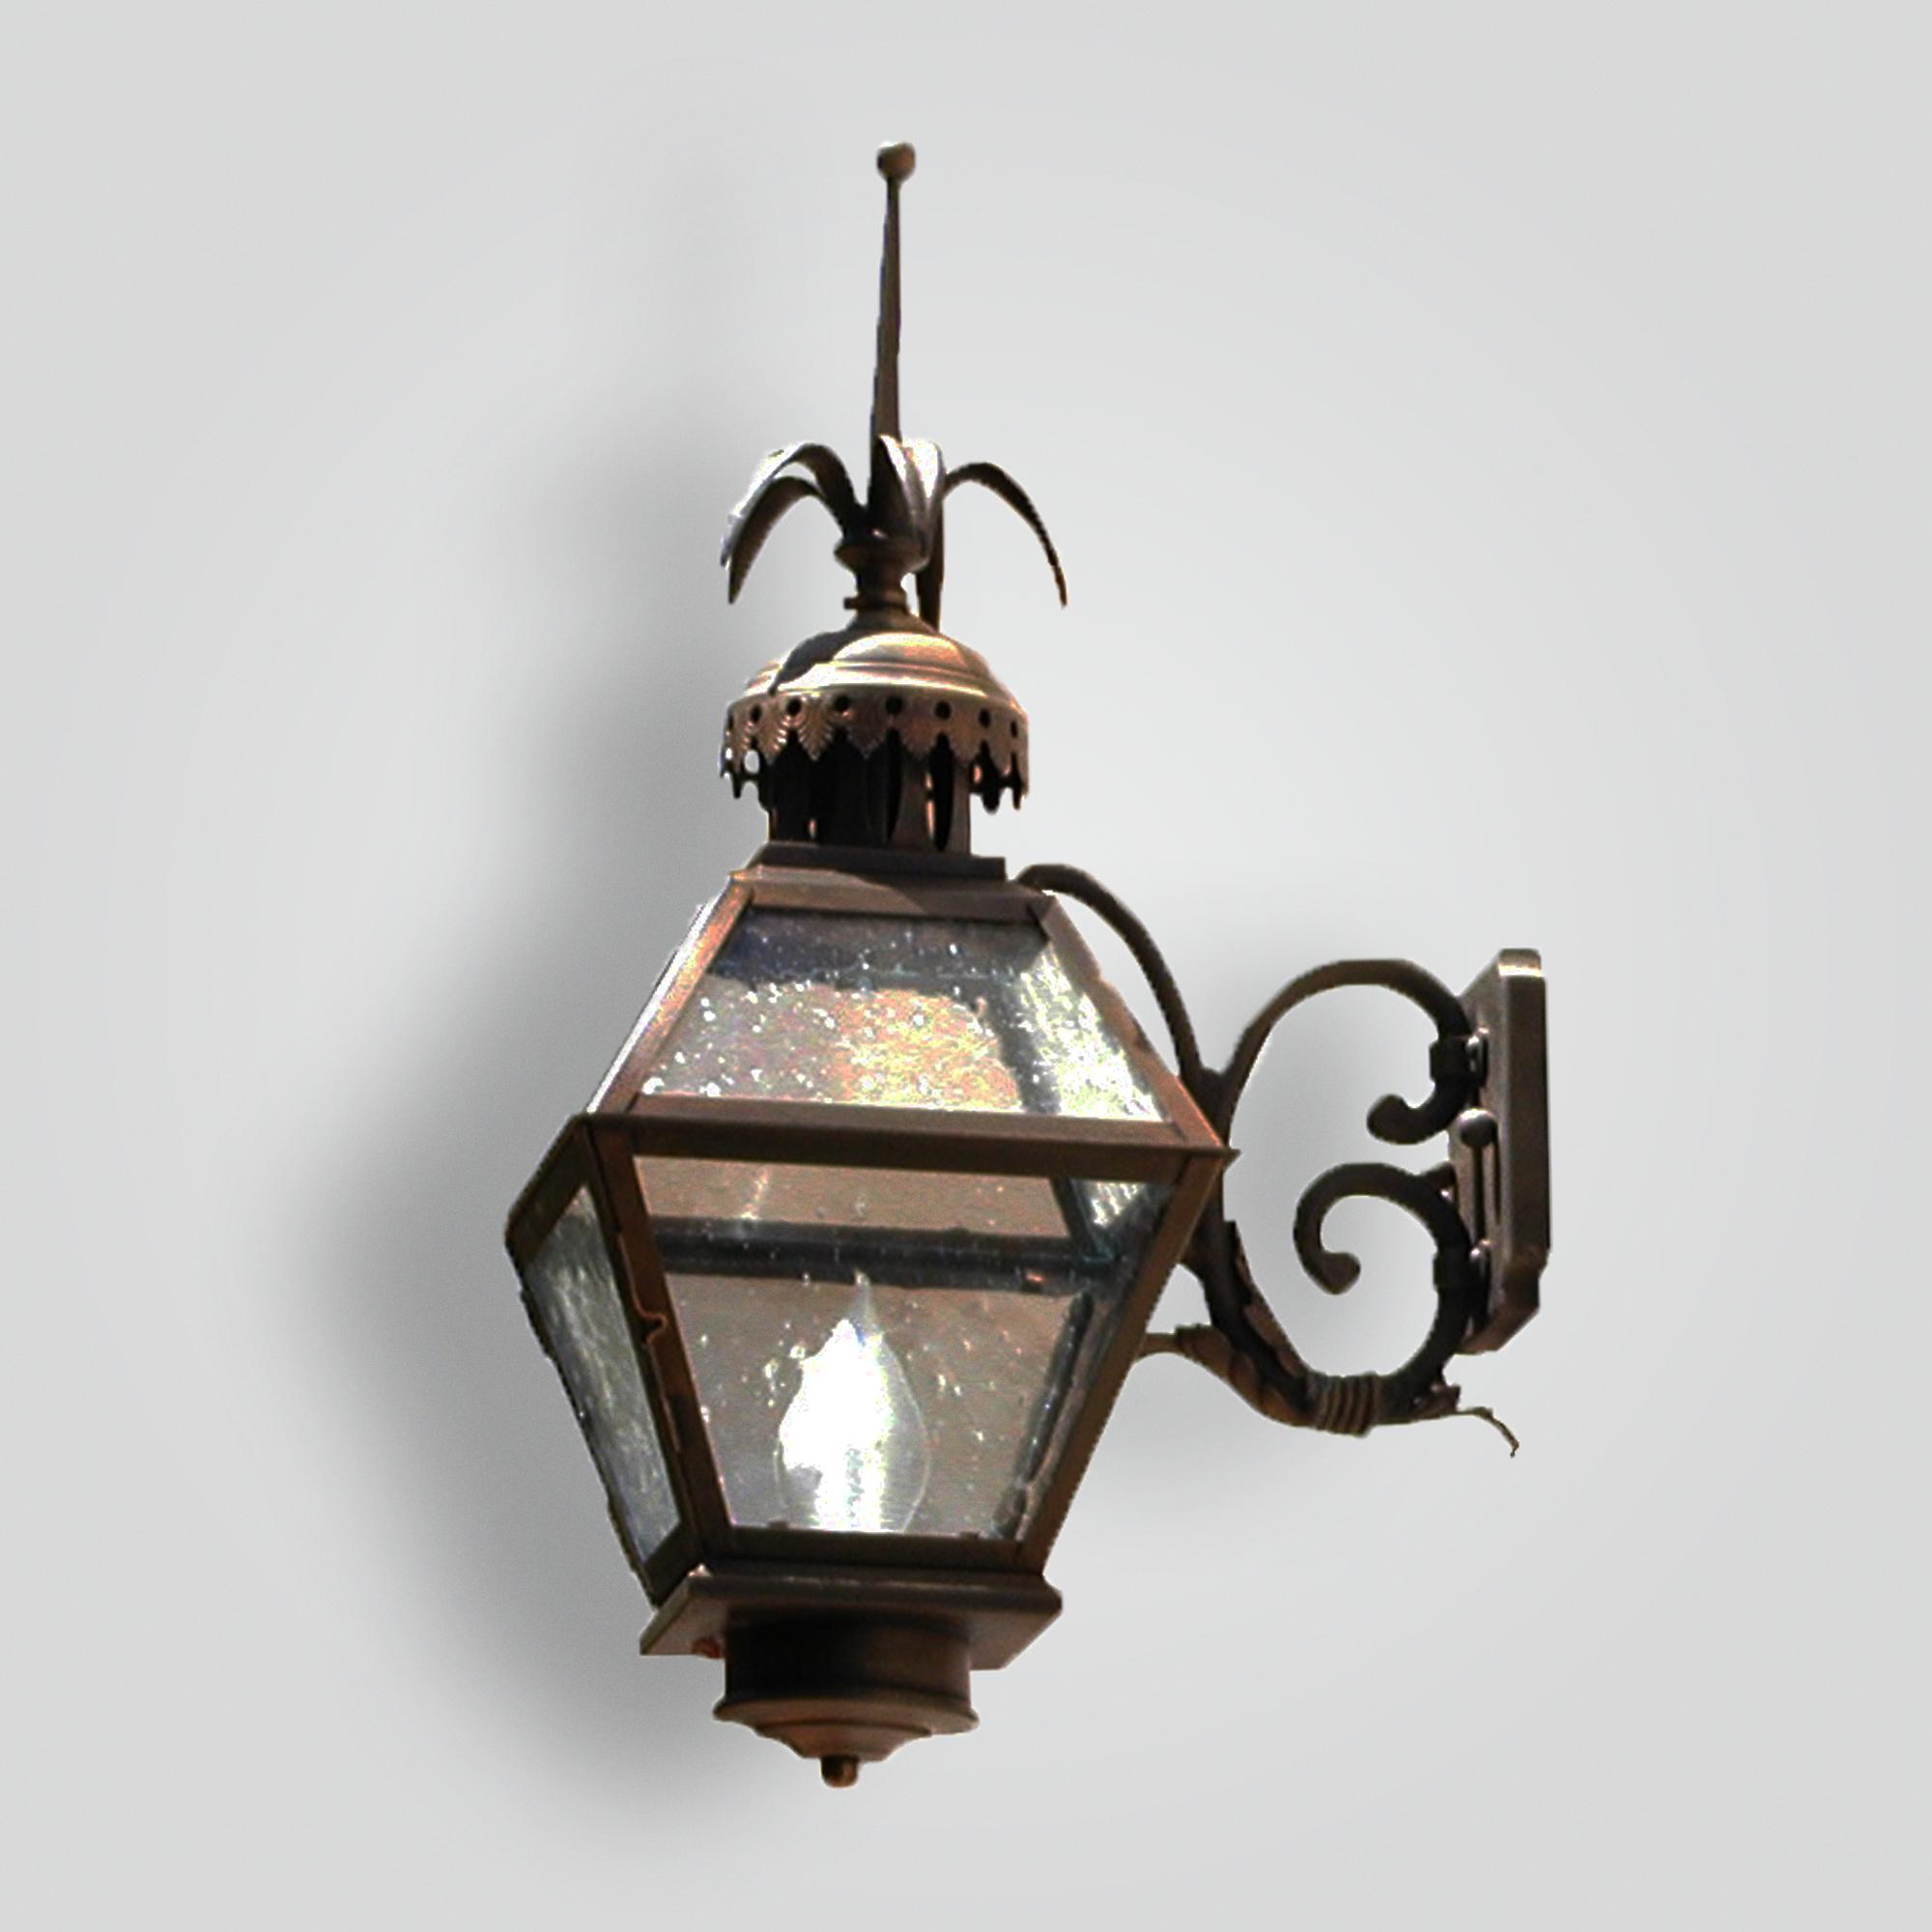 920-mb1-br-w-sh-alejandro-lantern – ADG Lighting Collection